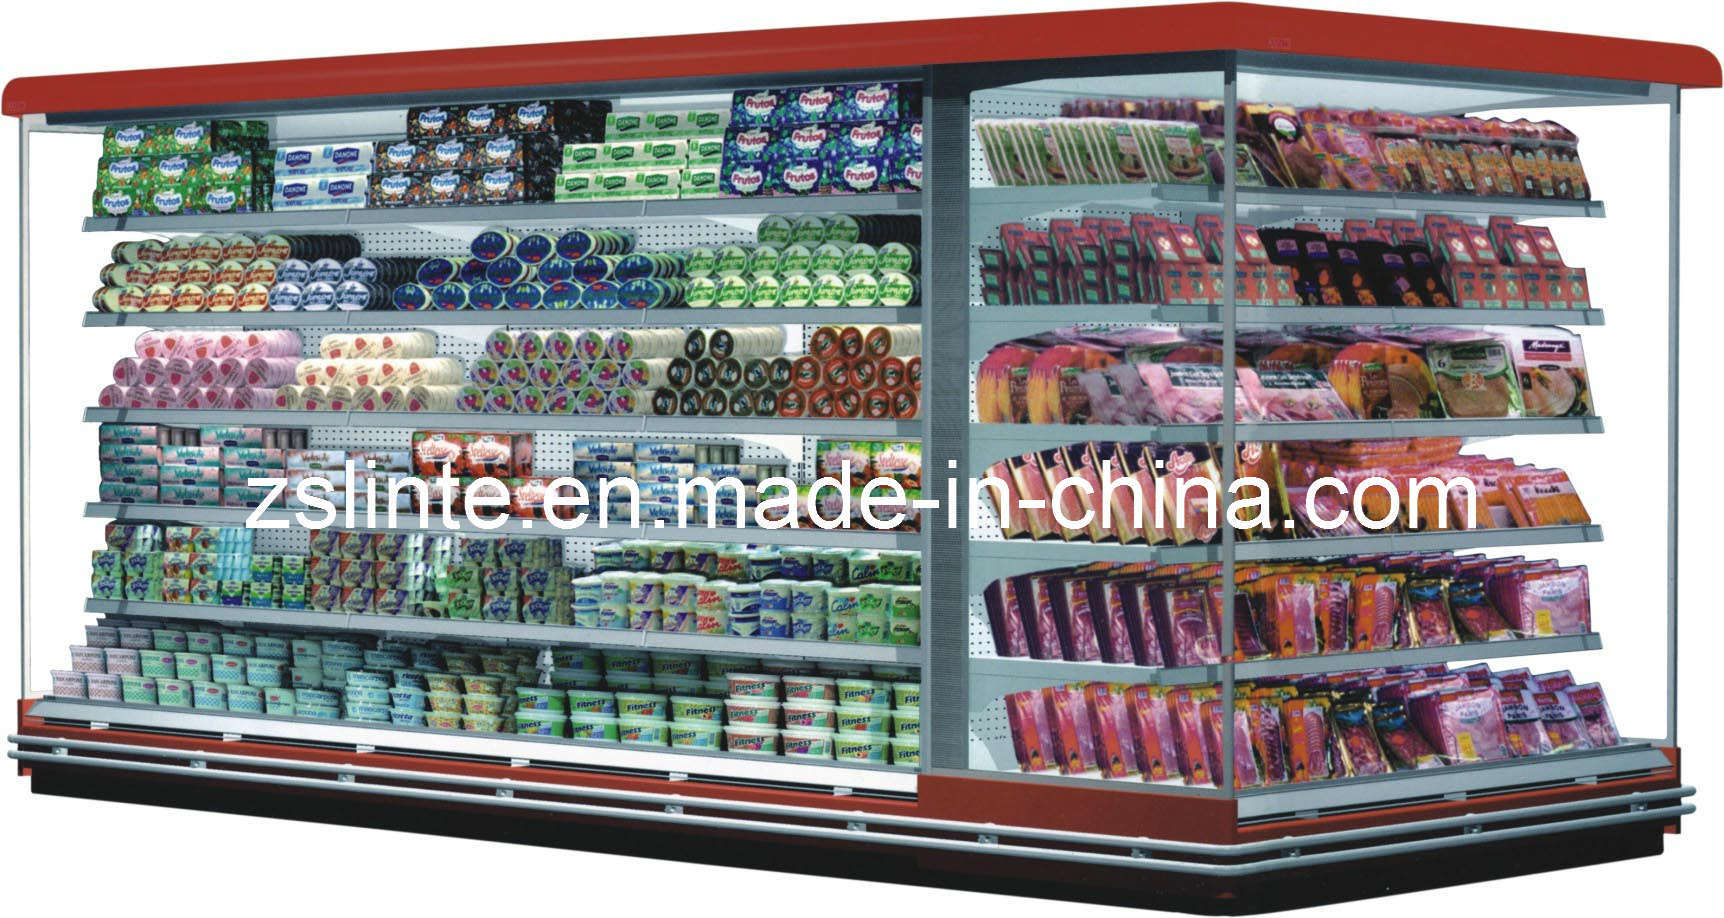 Supermarket refrigerator display show case freezer cabinet